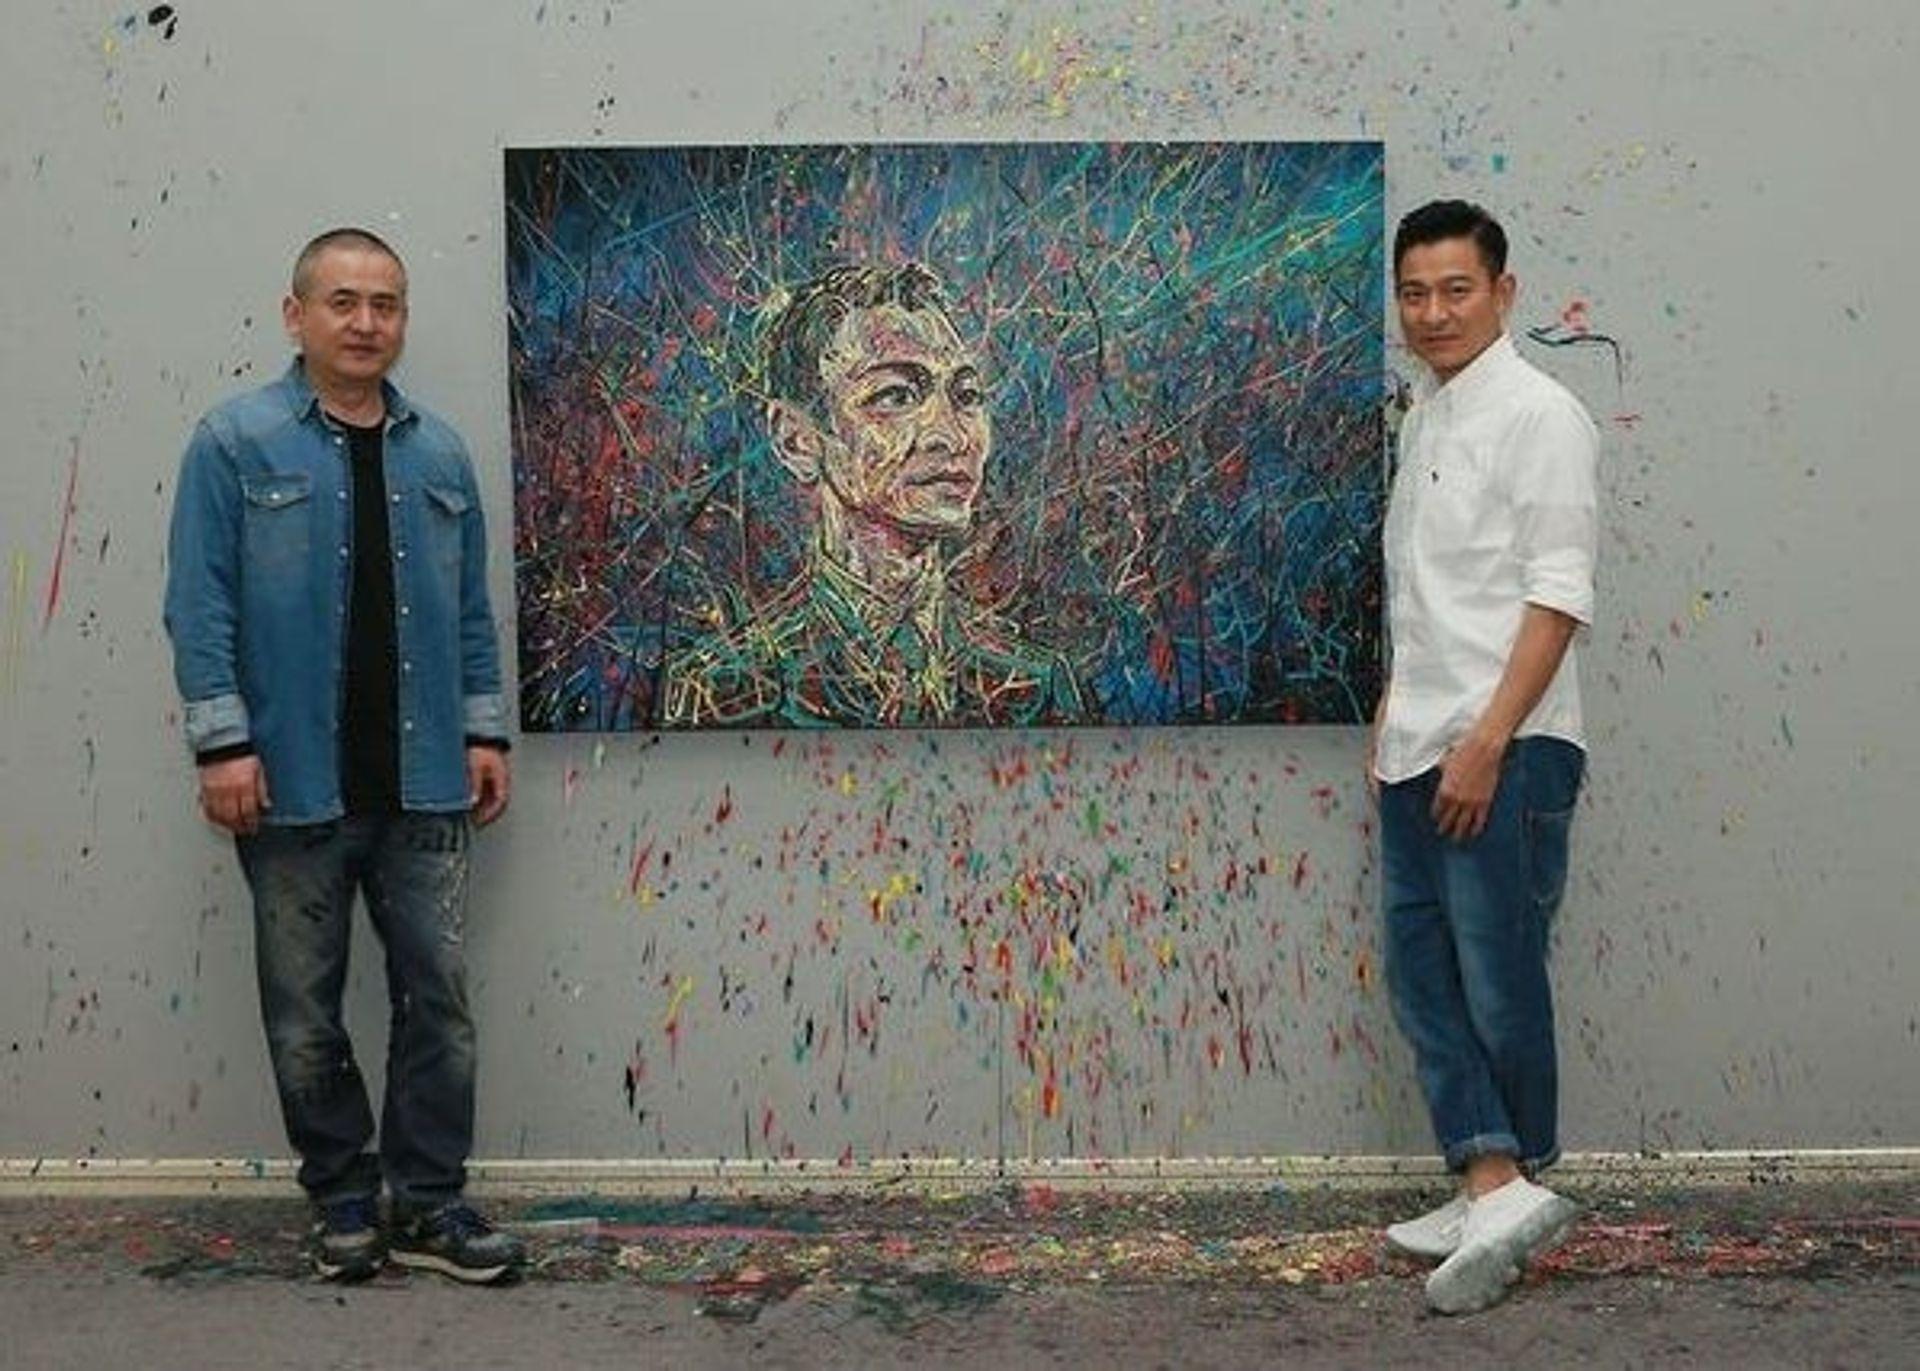 Chinese artist Zeng Fanzhi with the Hong Kong star Andy Lau Webo